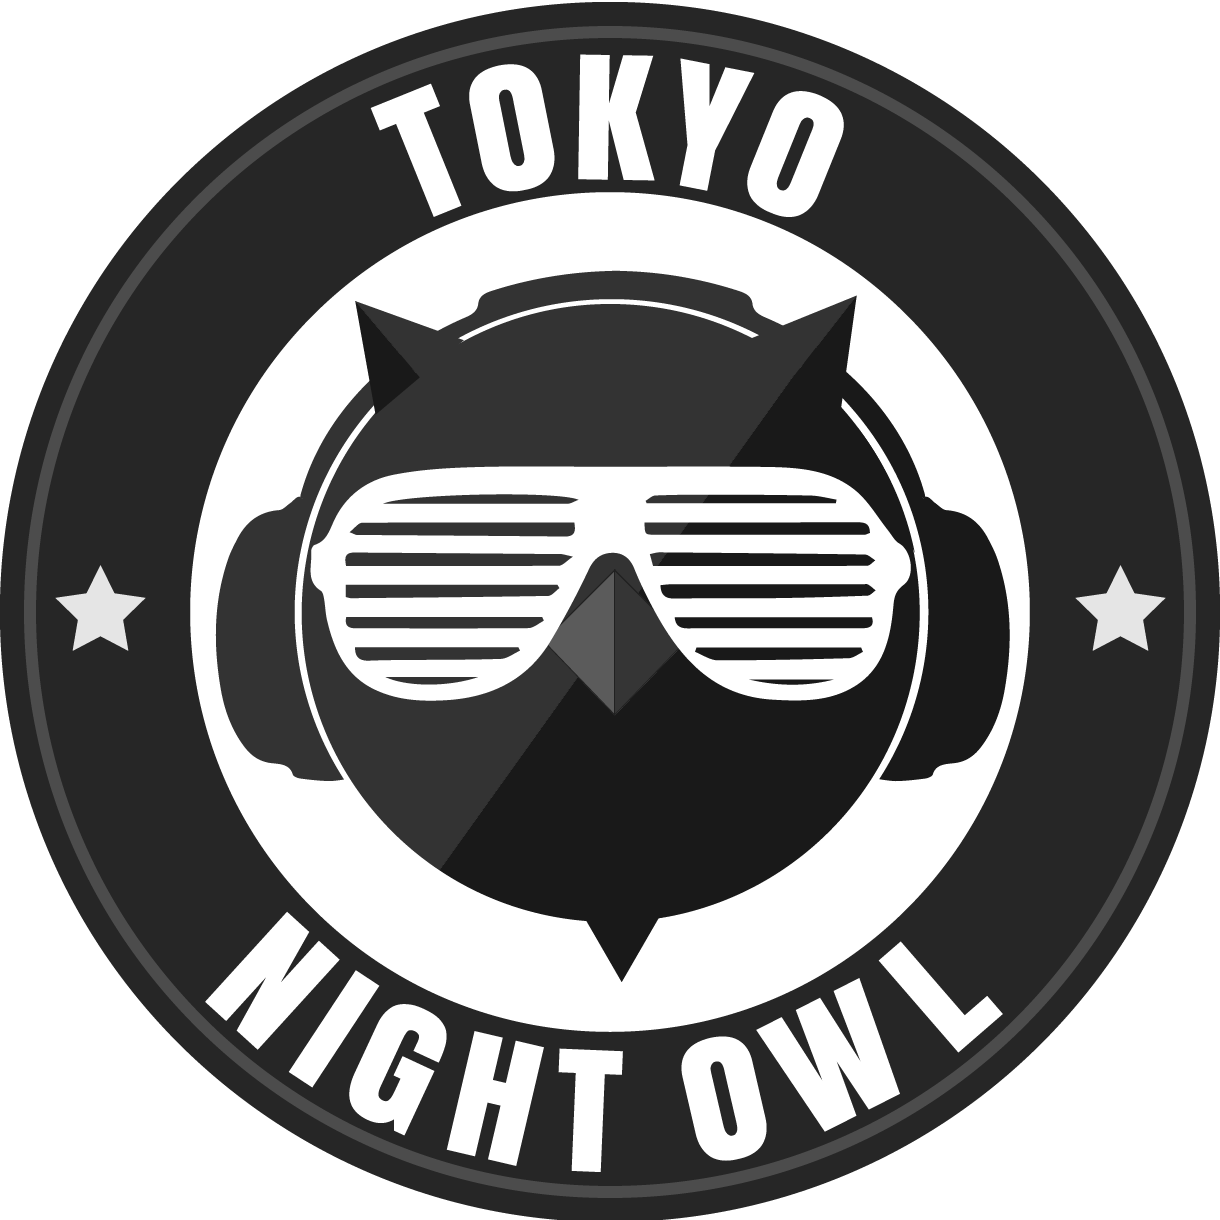 Tokyo Night Owl